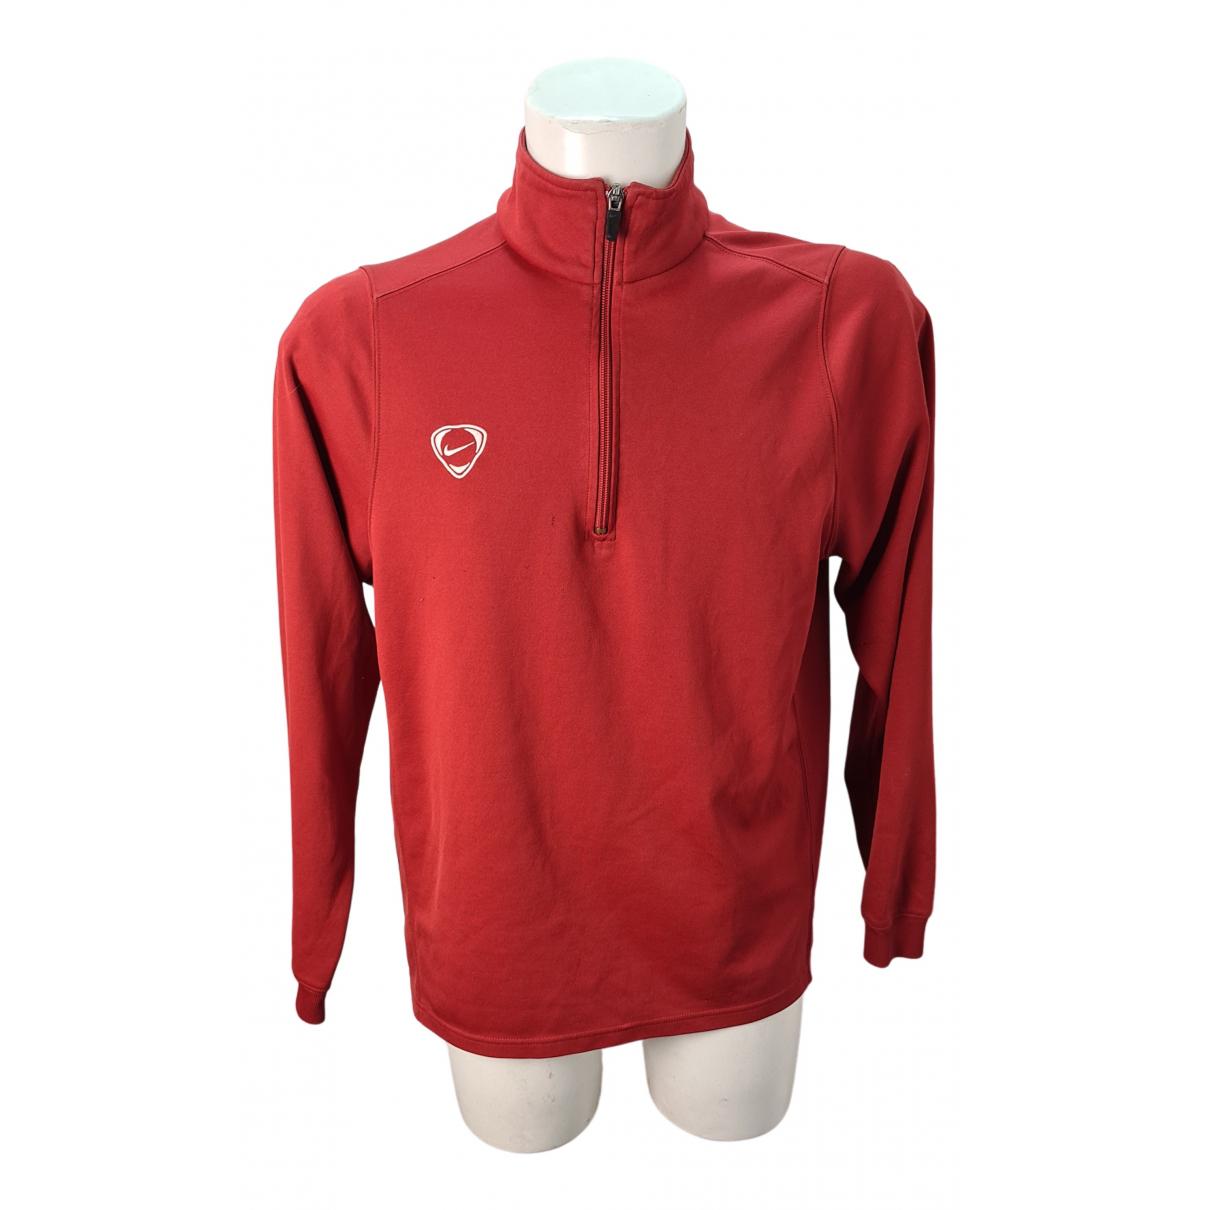 Nike N Red Knitwear & Sweatshirts for Men M International